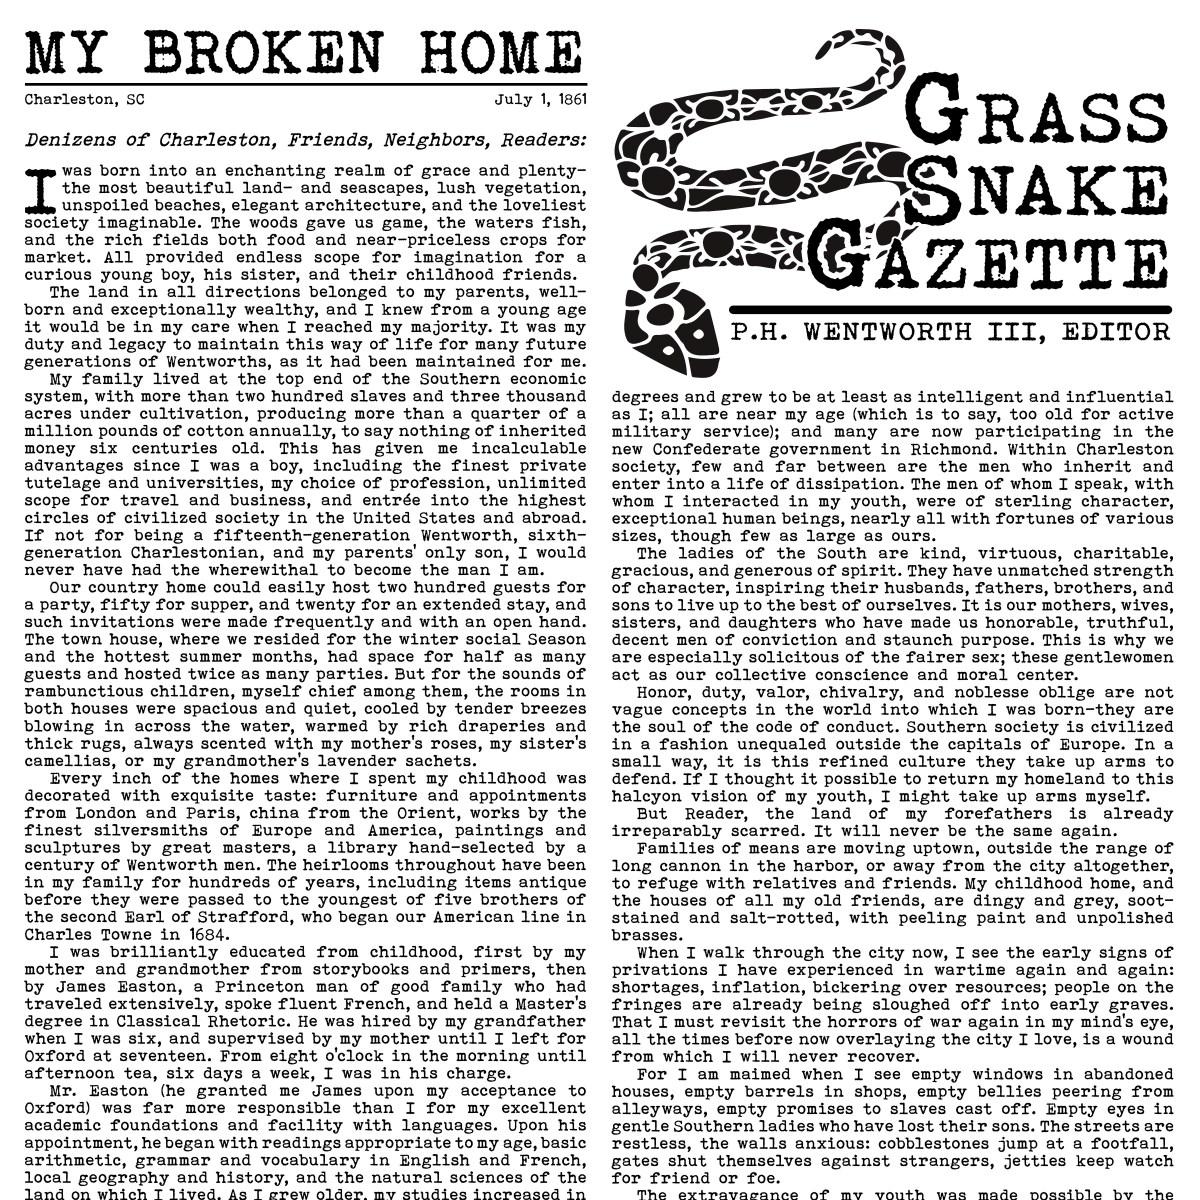 Editorial: The Grass Snake Gazette Broadside